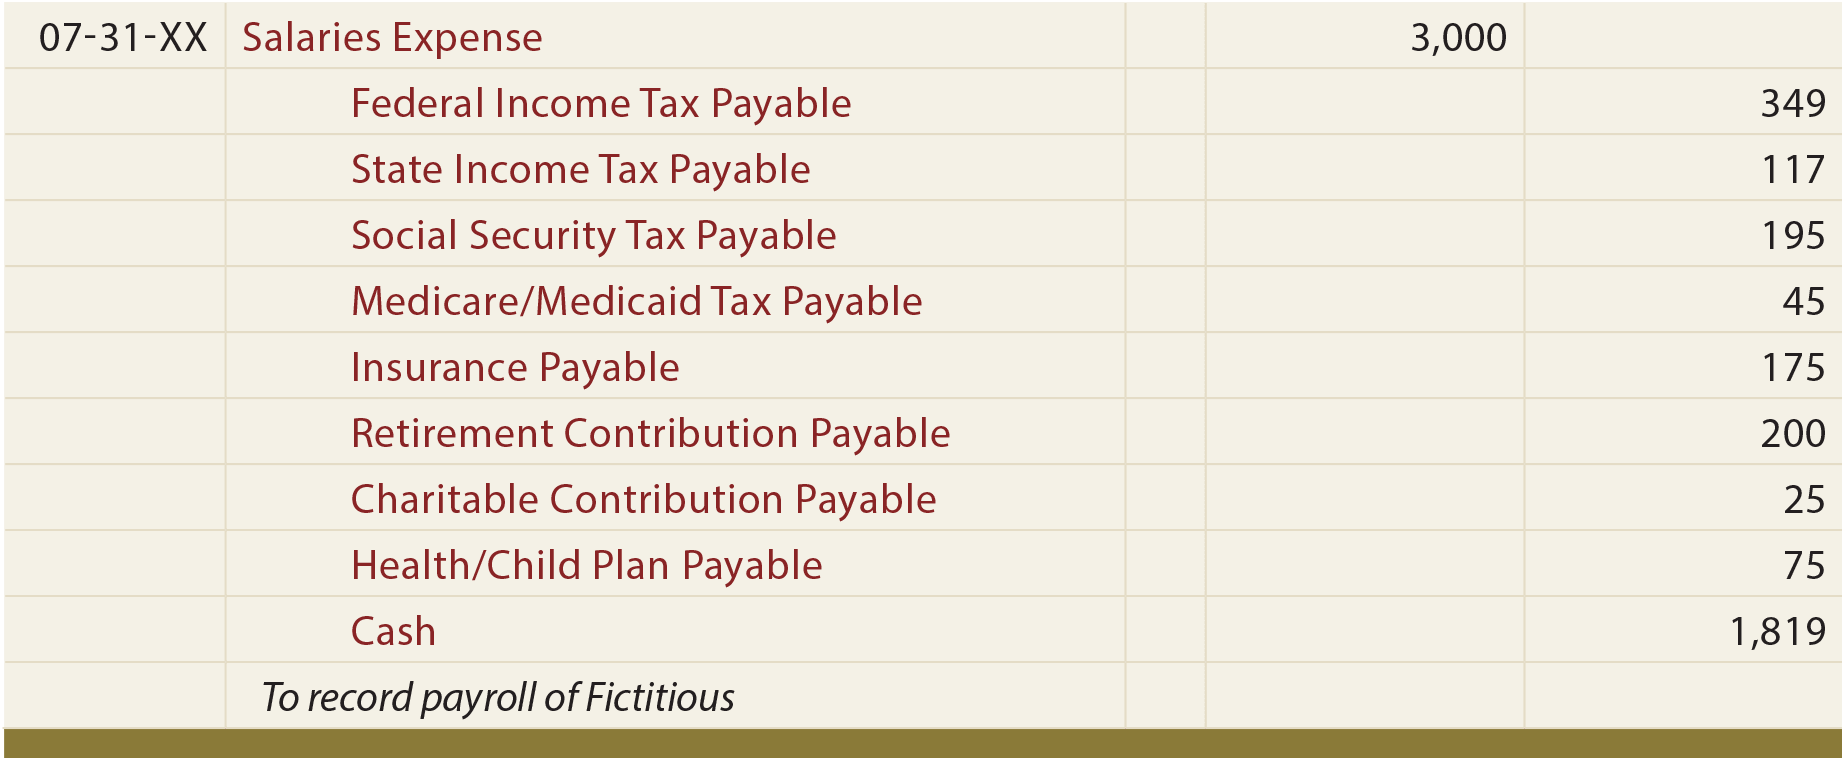 Payroll - principlesofaccounting.com